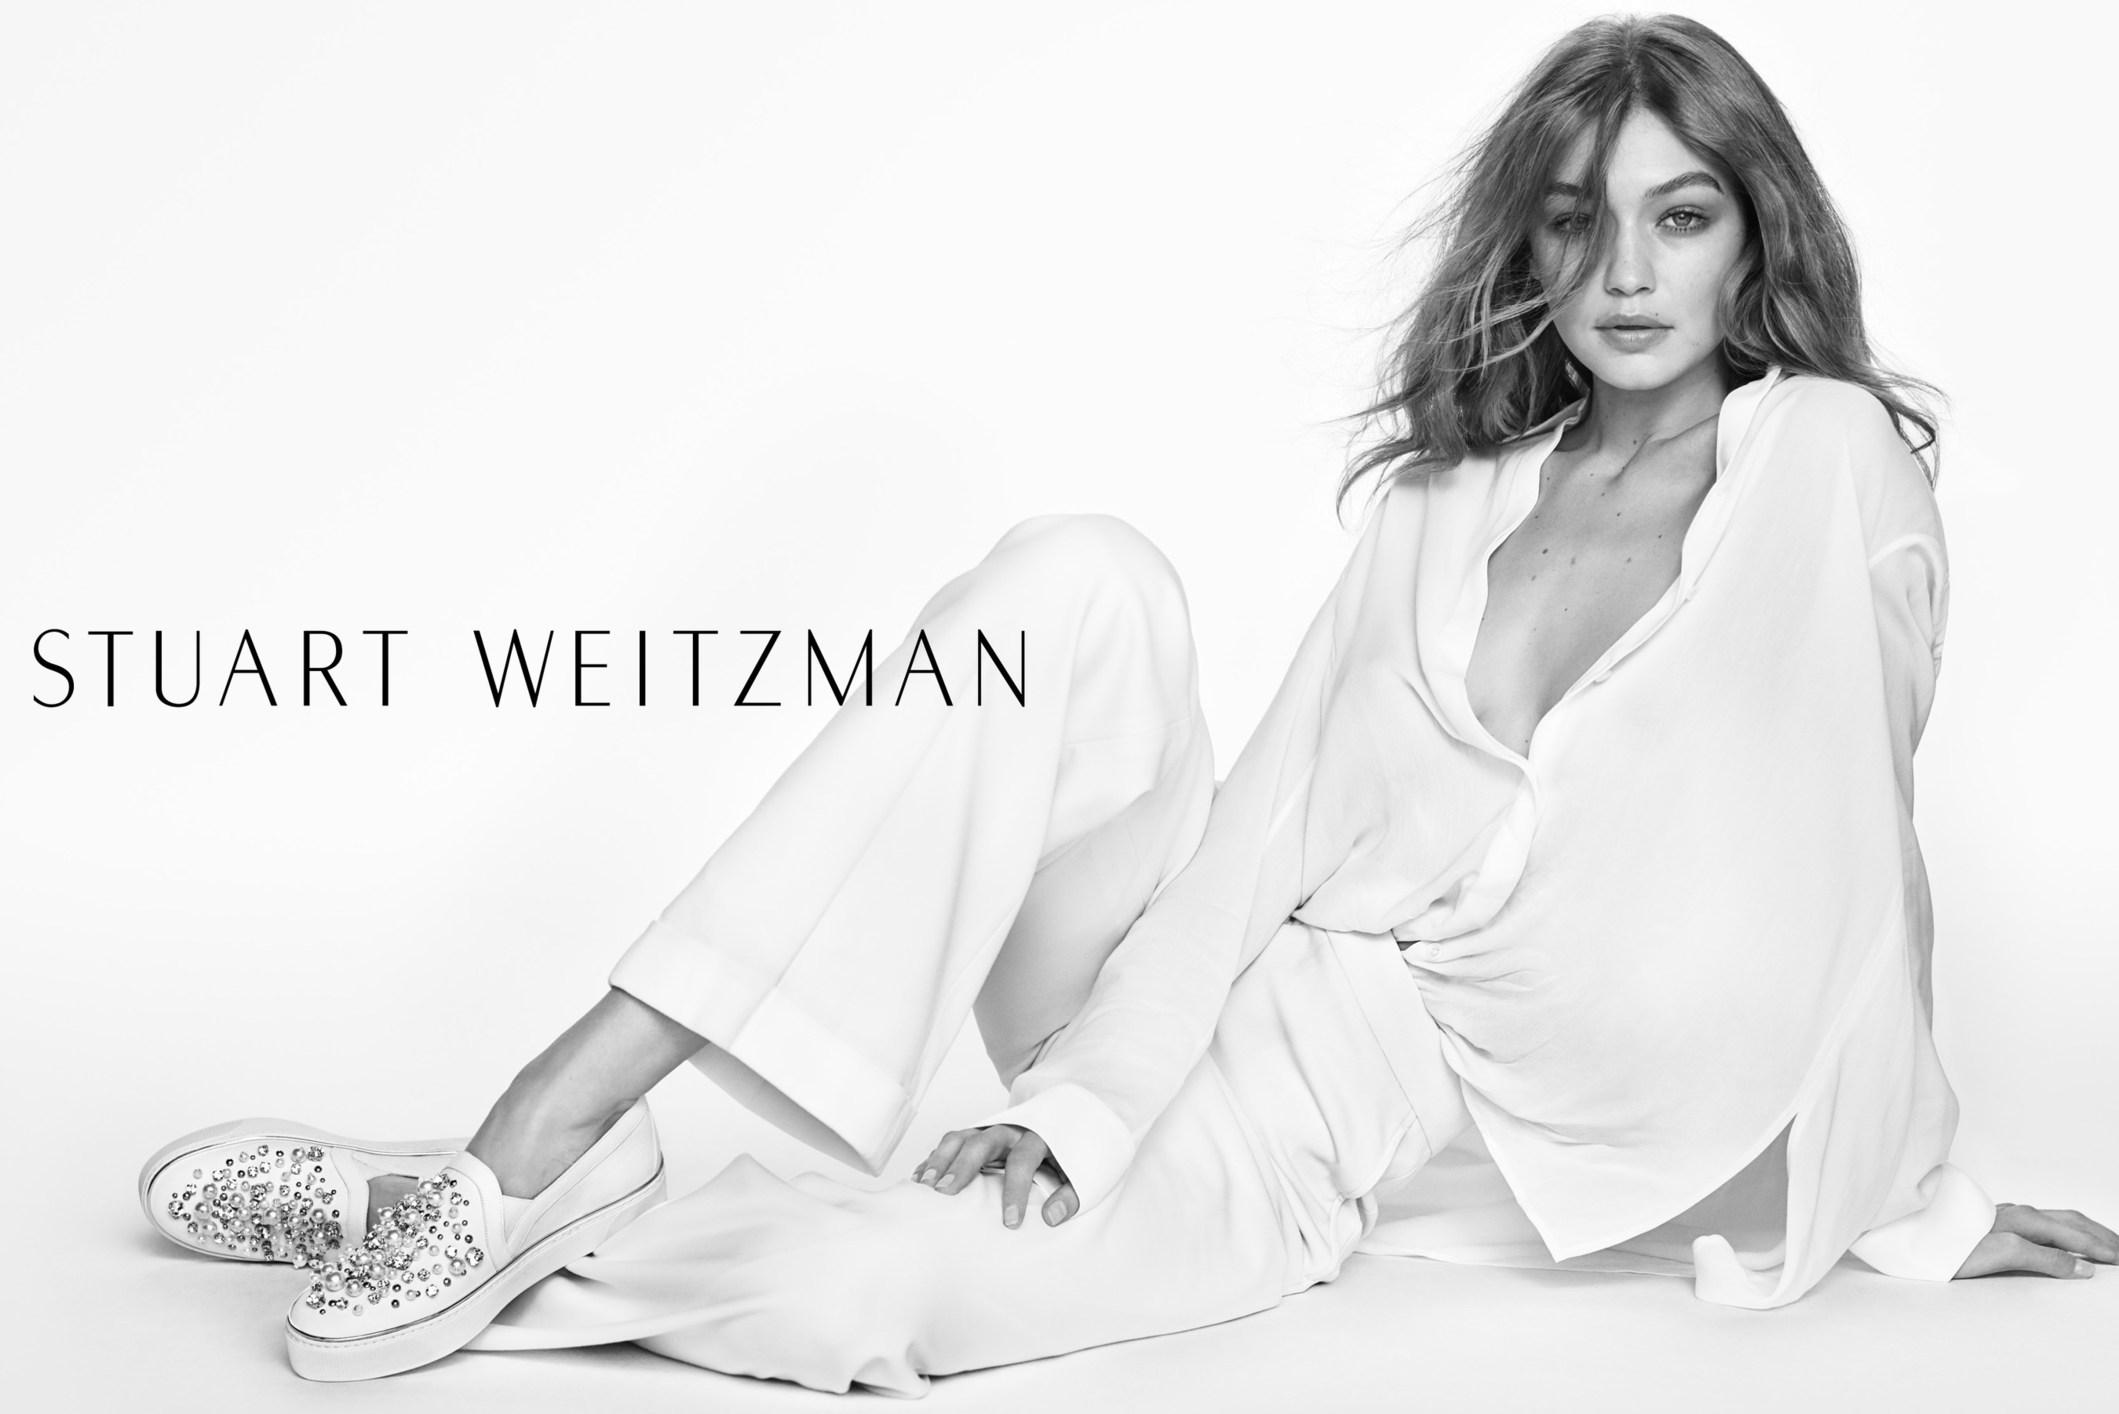 The Stuart Weitzman Spring 2017 Advertising Campaign Starring Gigi Hadid-1096